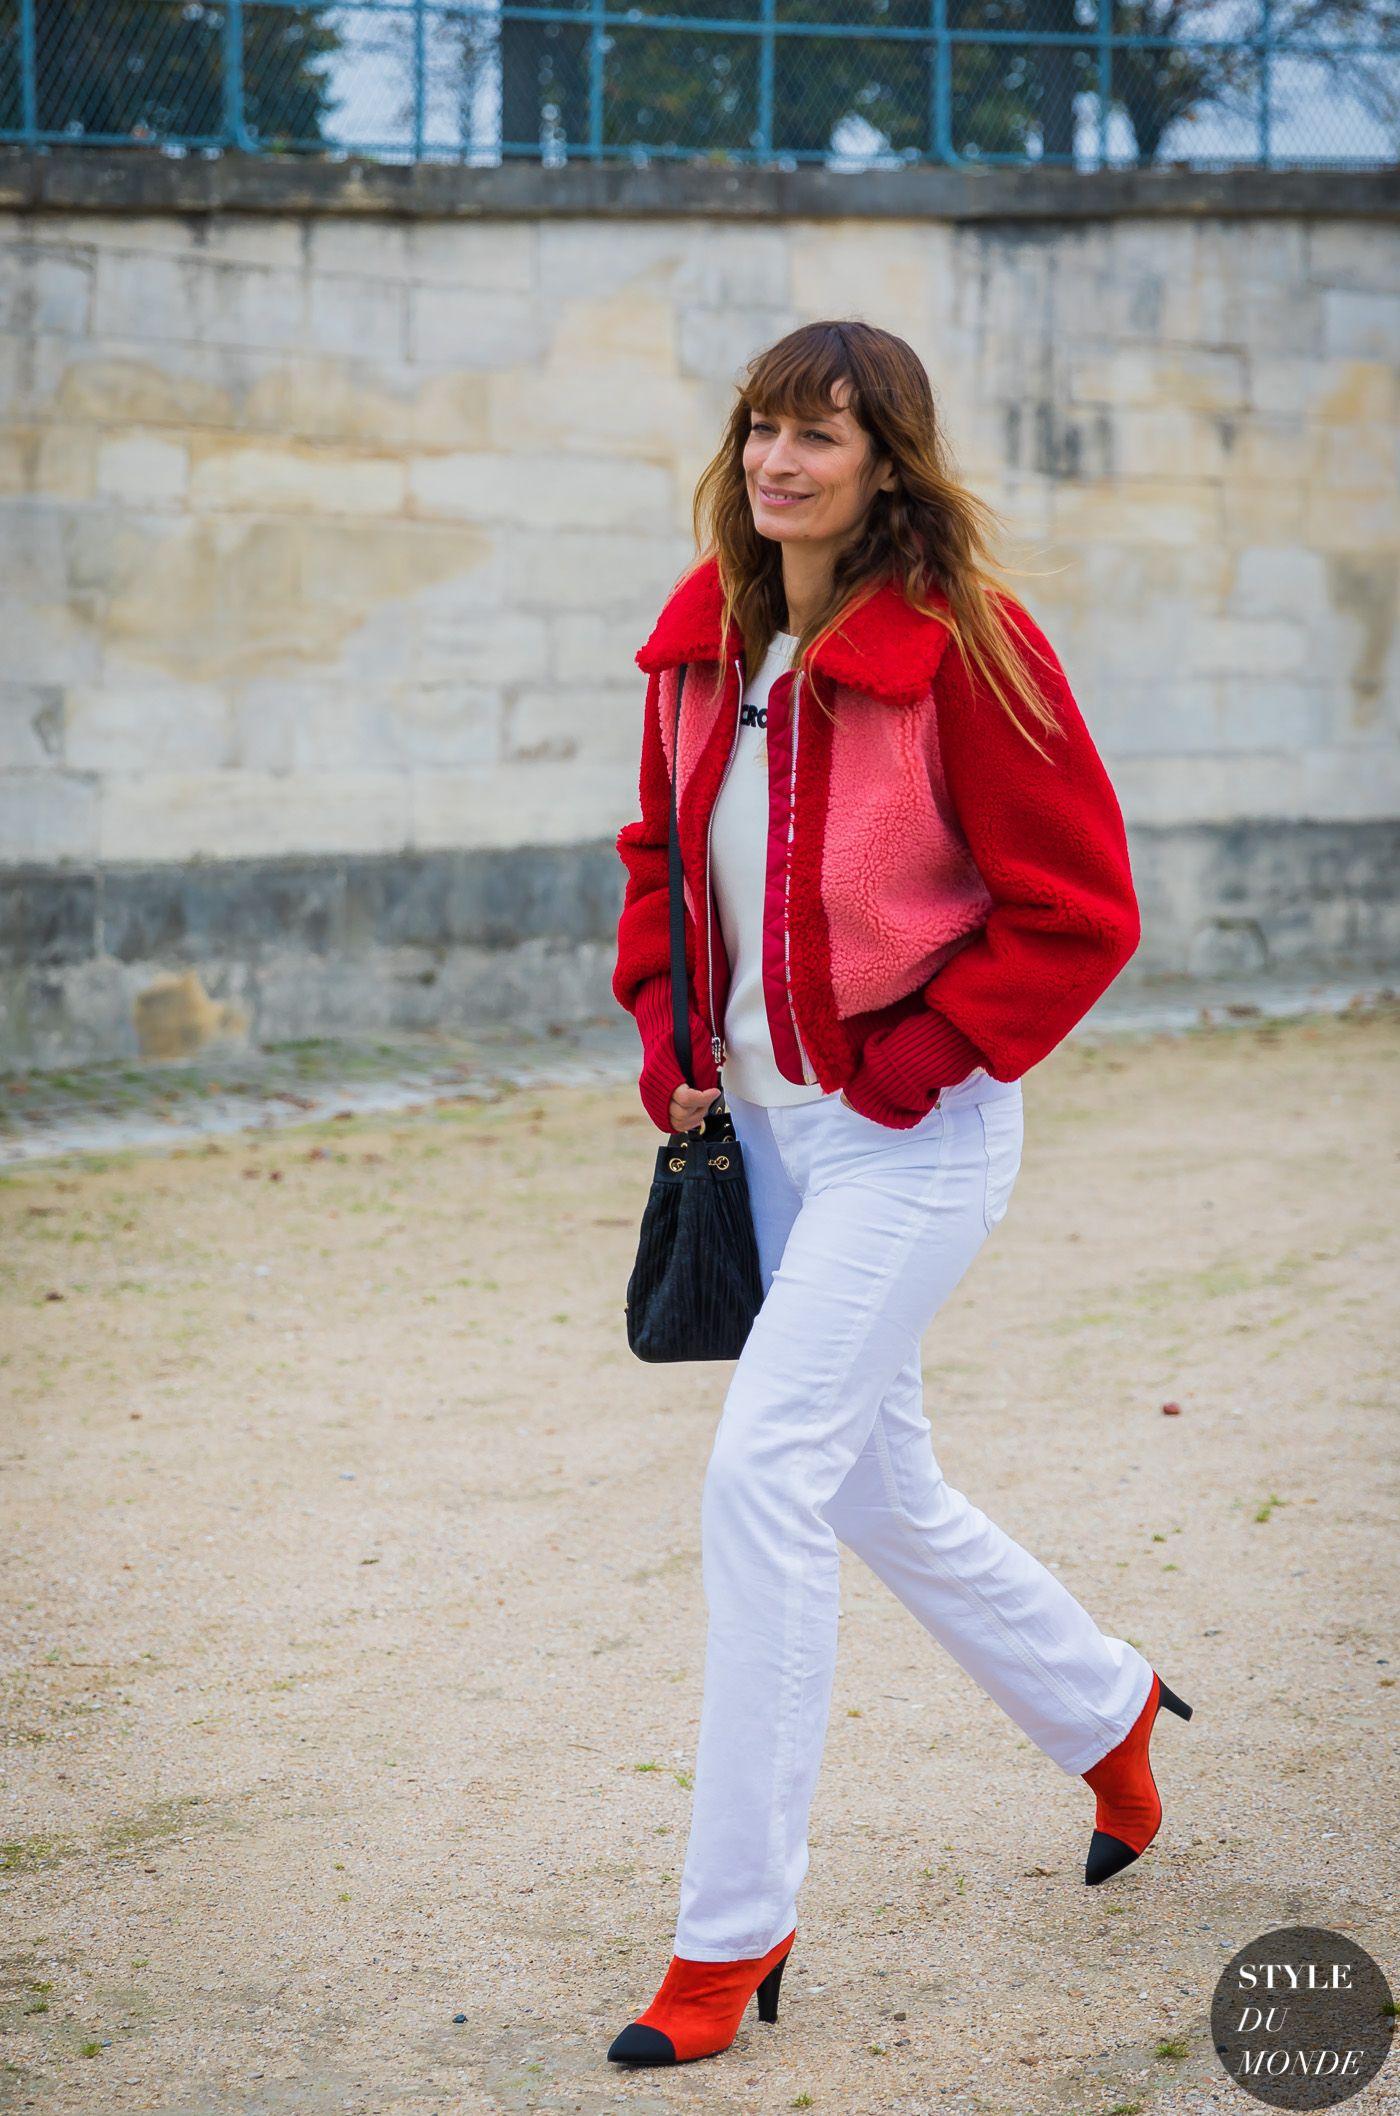 Paris SS 2018 Street Style  Caroline de Maigret 42eea59a543